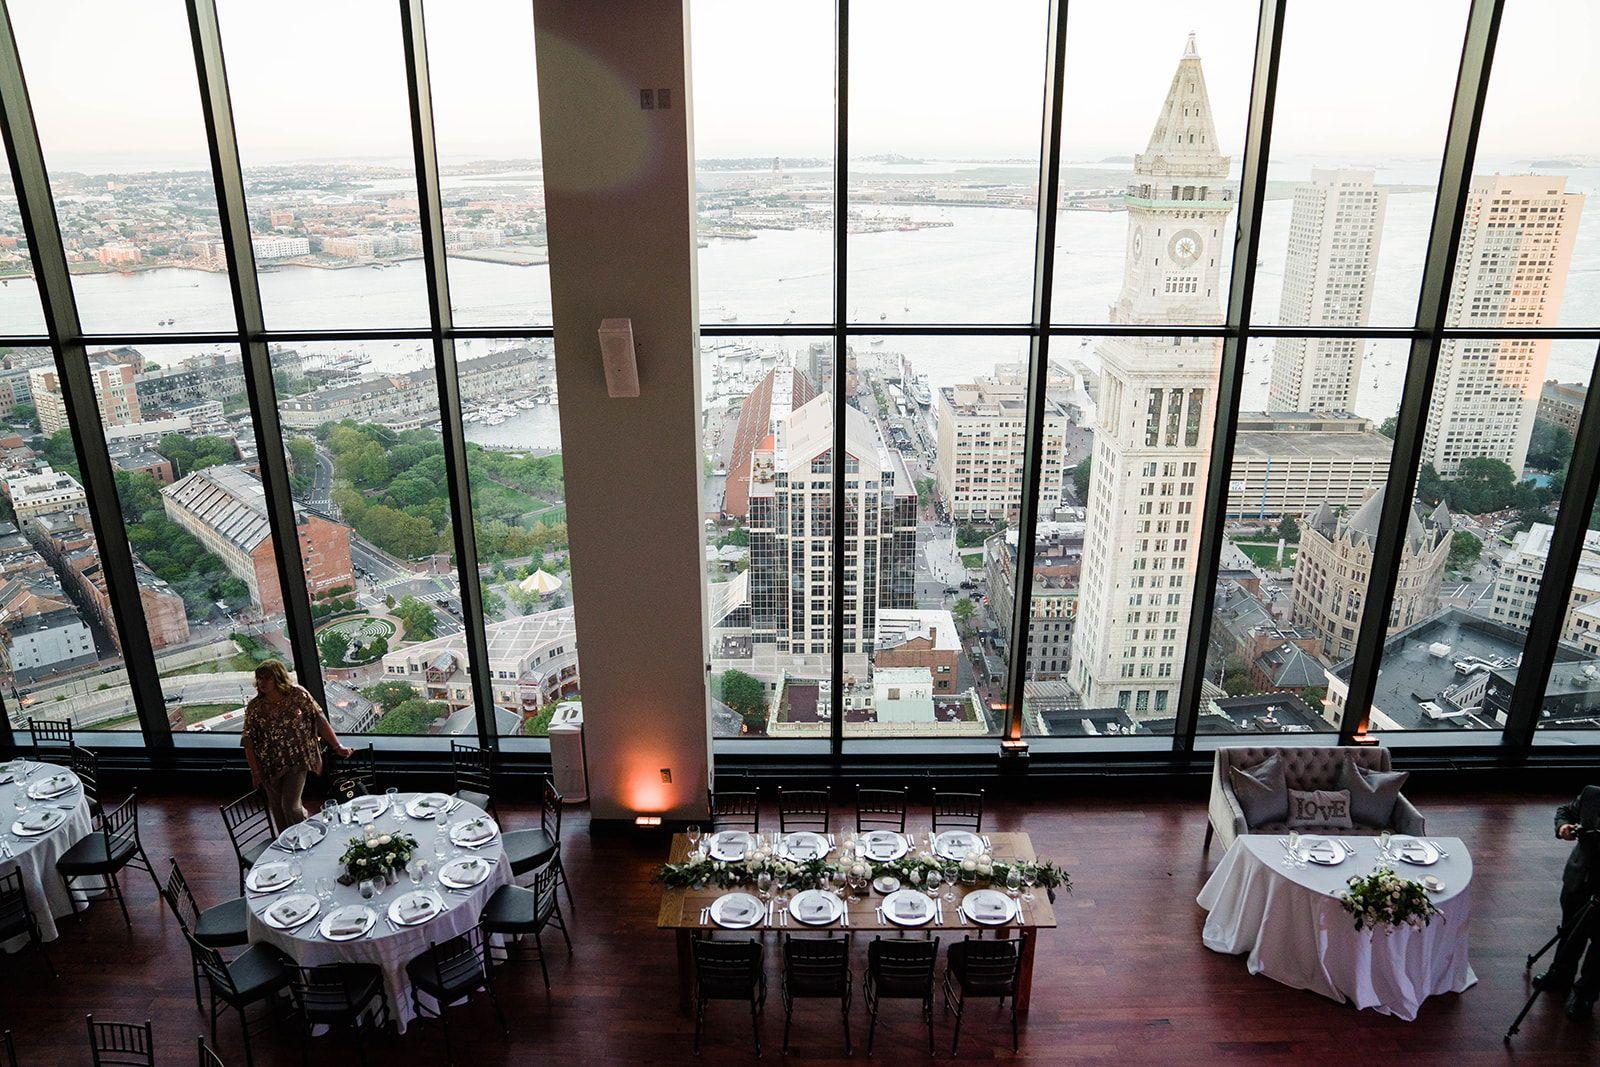 Real Boston Wedding At The State Room Boston Ma Longwood Venues Gina Brocker Photography Massachusetts Wedding Venues Boston Wedding Venues Wedding Boston